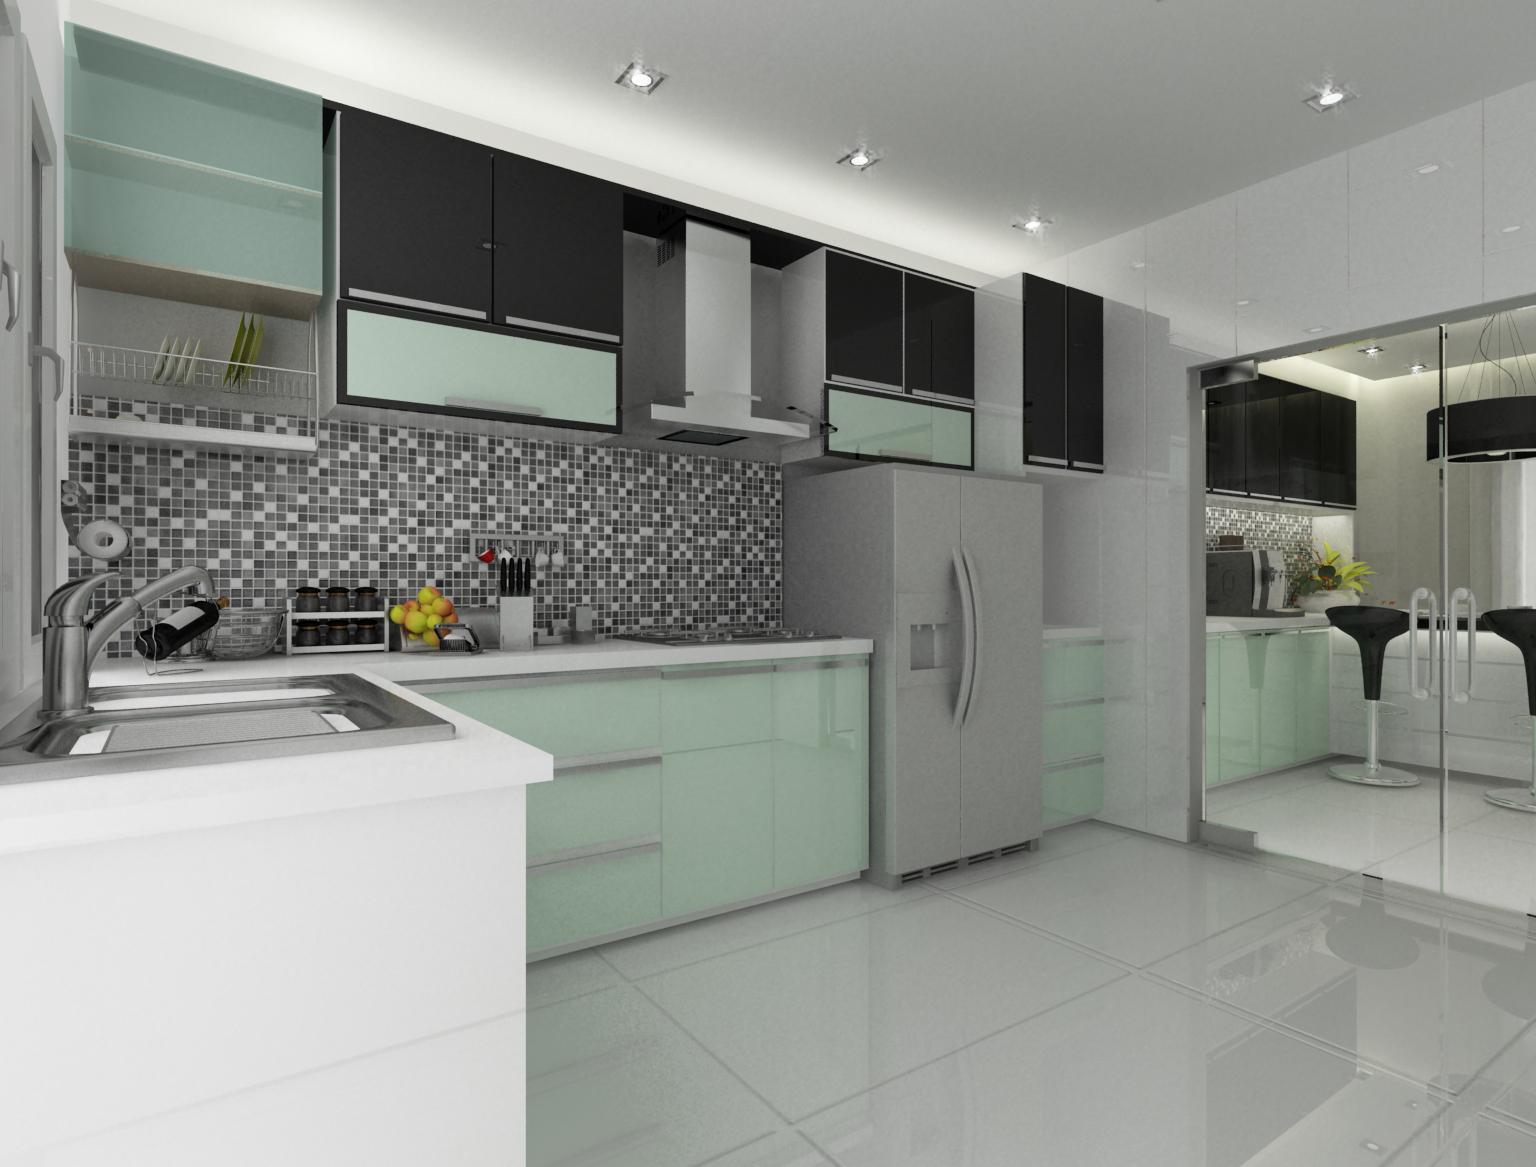 Modern Dry Kitchen Kip Park Terrace House Design By Doidoi Yap At Coroflot  Com . Modern Dry Kitchen ...